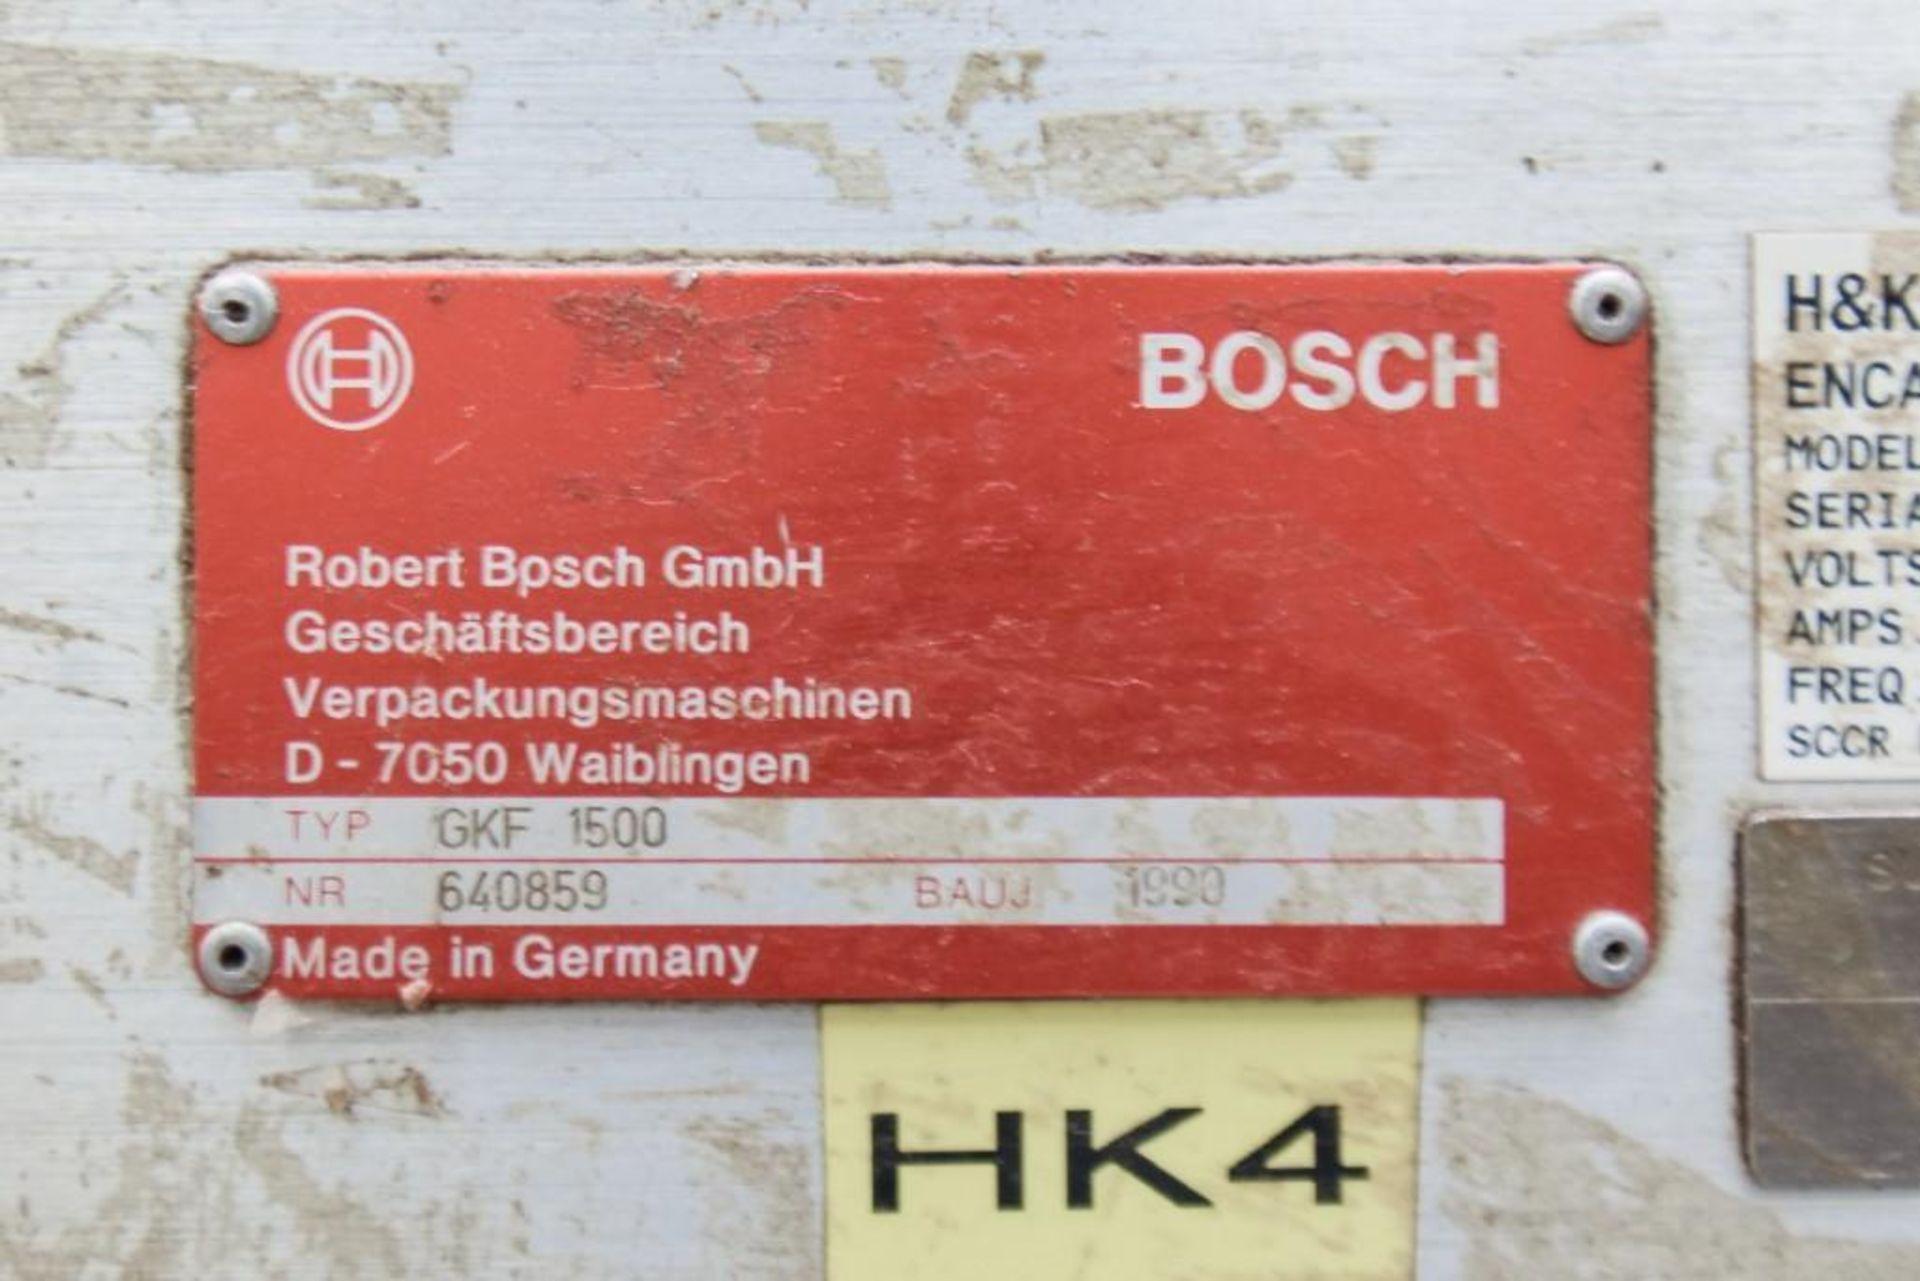 GFK 1500 Bosch Encapsulation Machine - Image 10 of 11